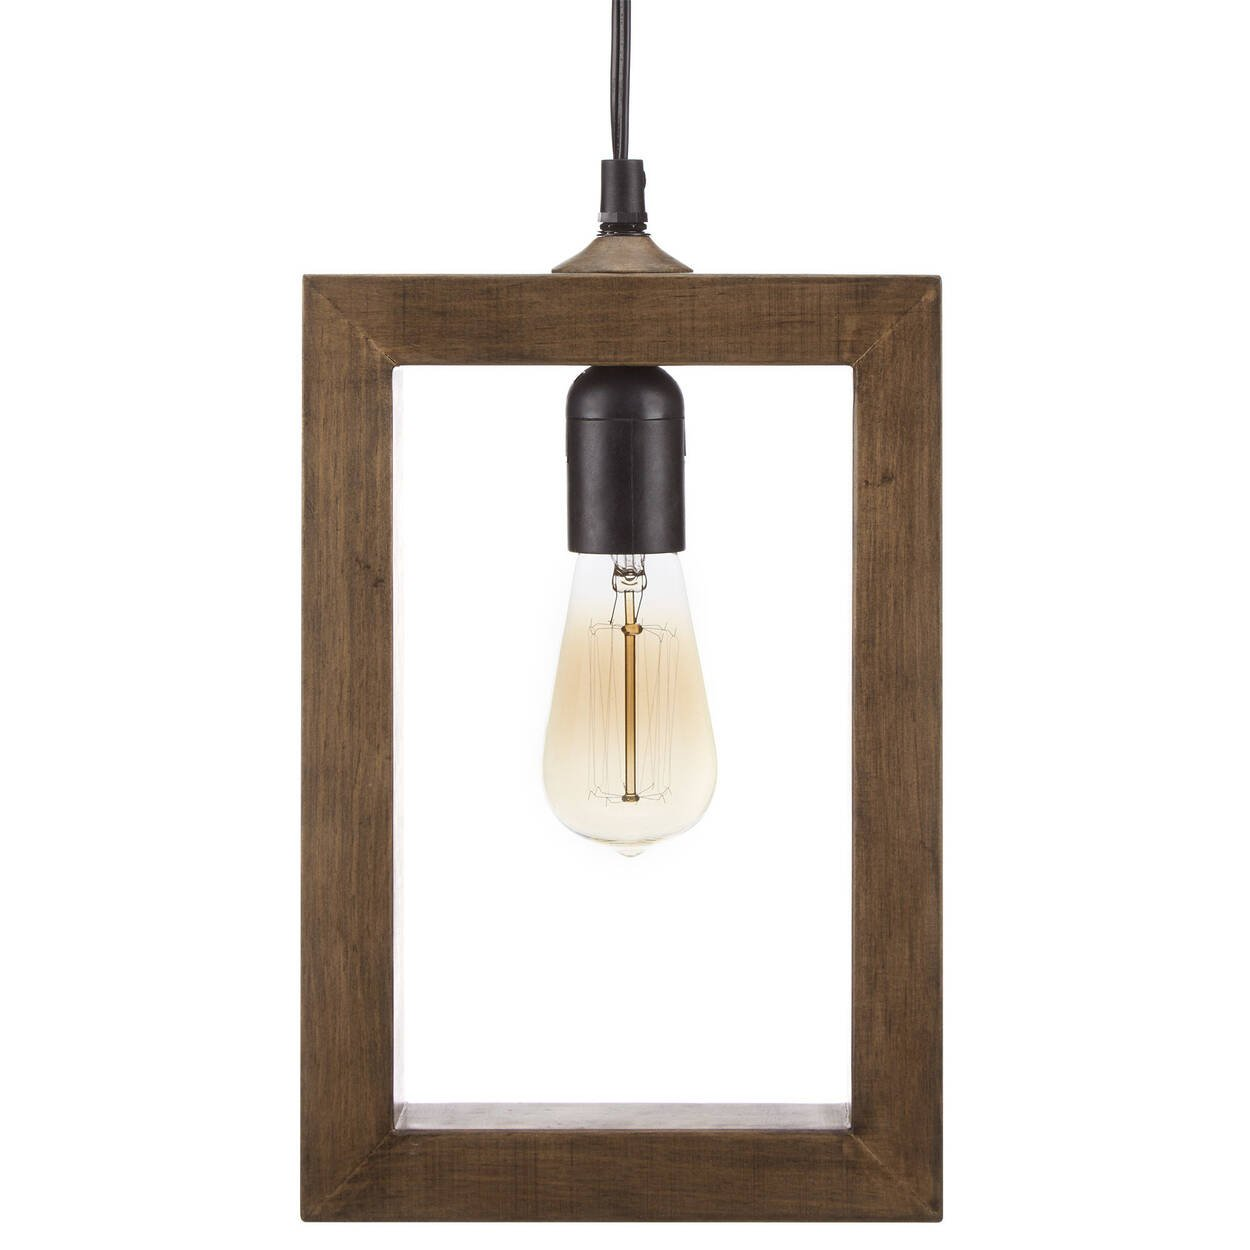 Wooden Frame Pendant Ceiling Lamp   Bouclair.com